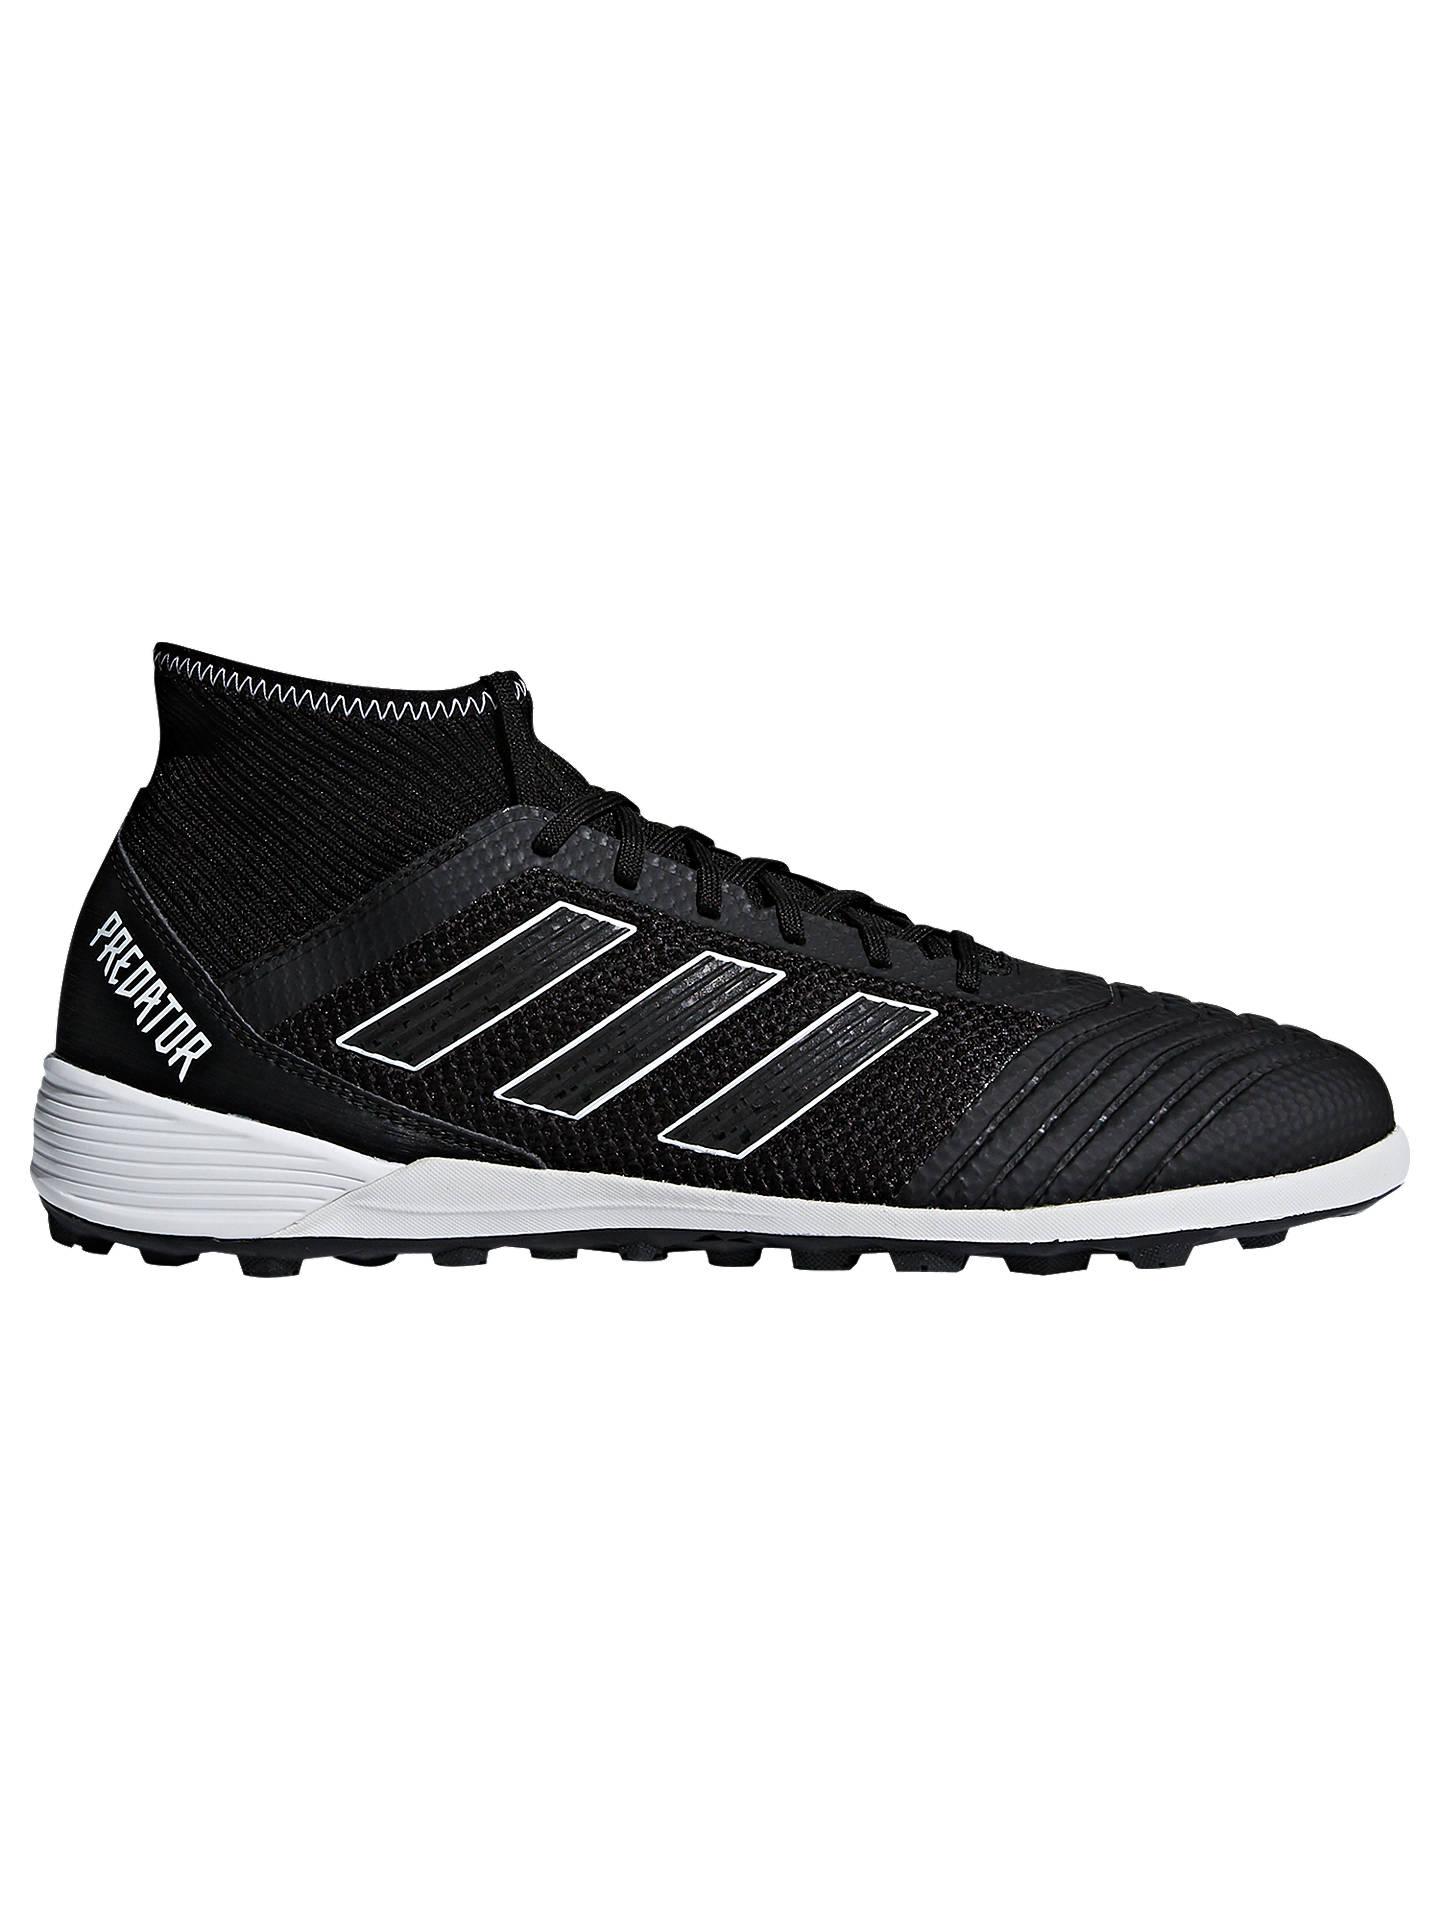 c8fe3b9f41d2 adidas Predator Tango 18.4 Men s Artificial Turf Football Shoes ...